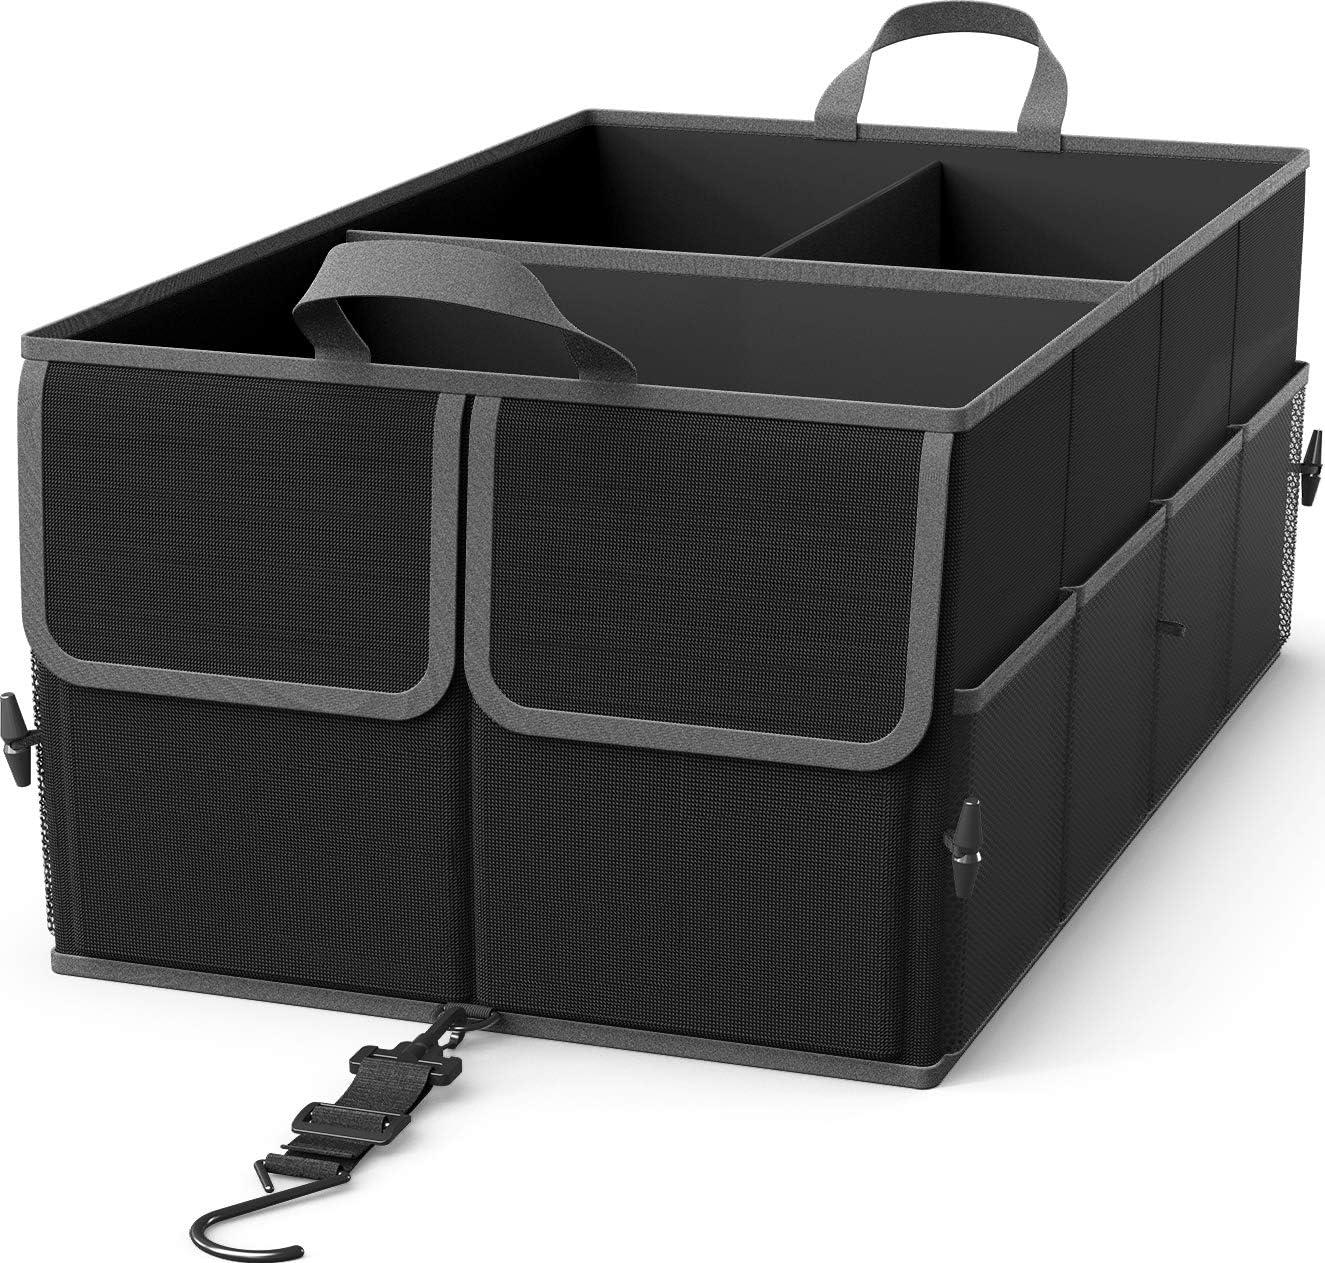 EPAuto 3-Compartment Cargo Trunk Storage Organizer